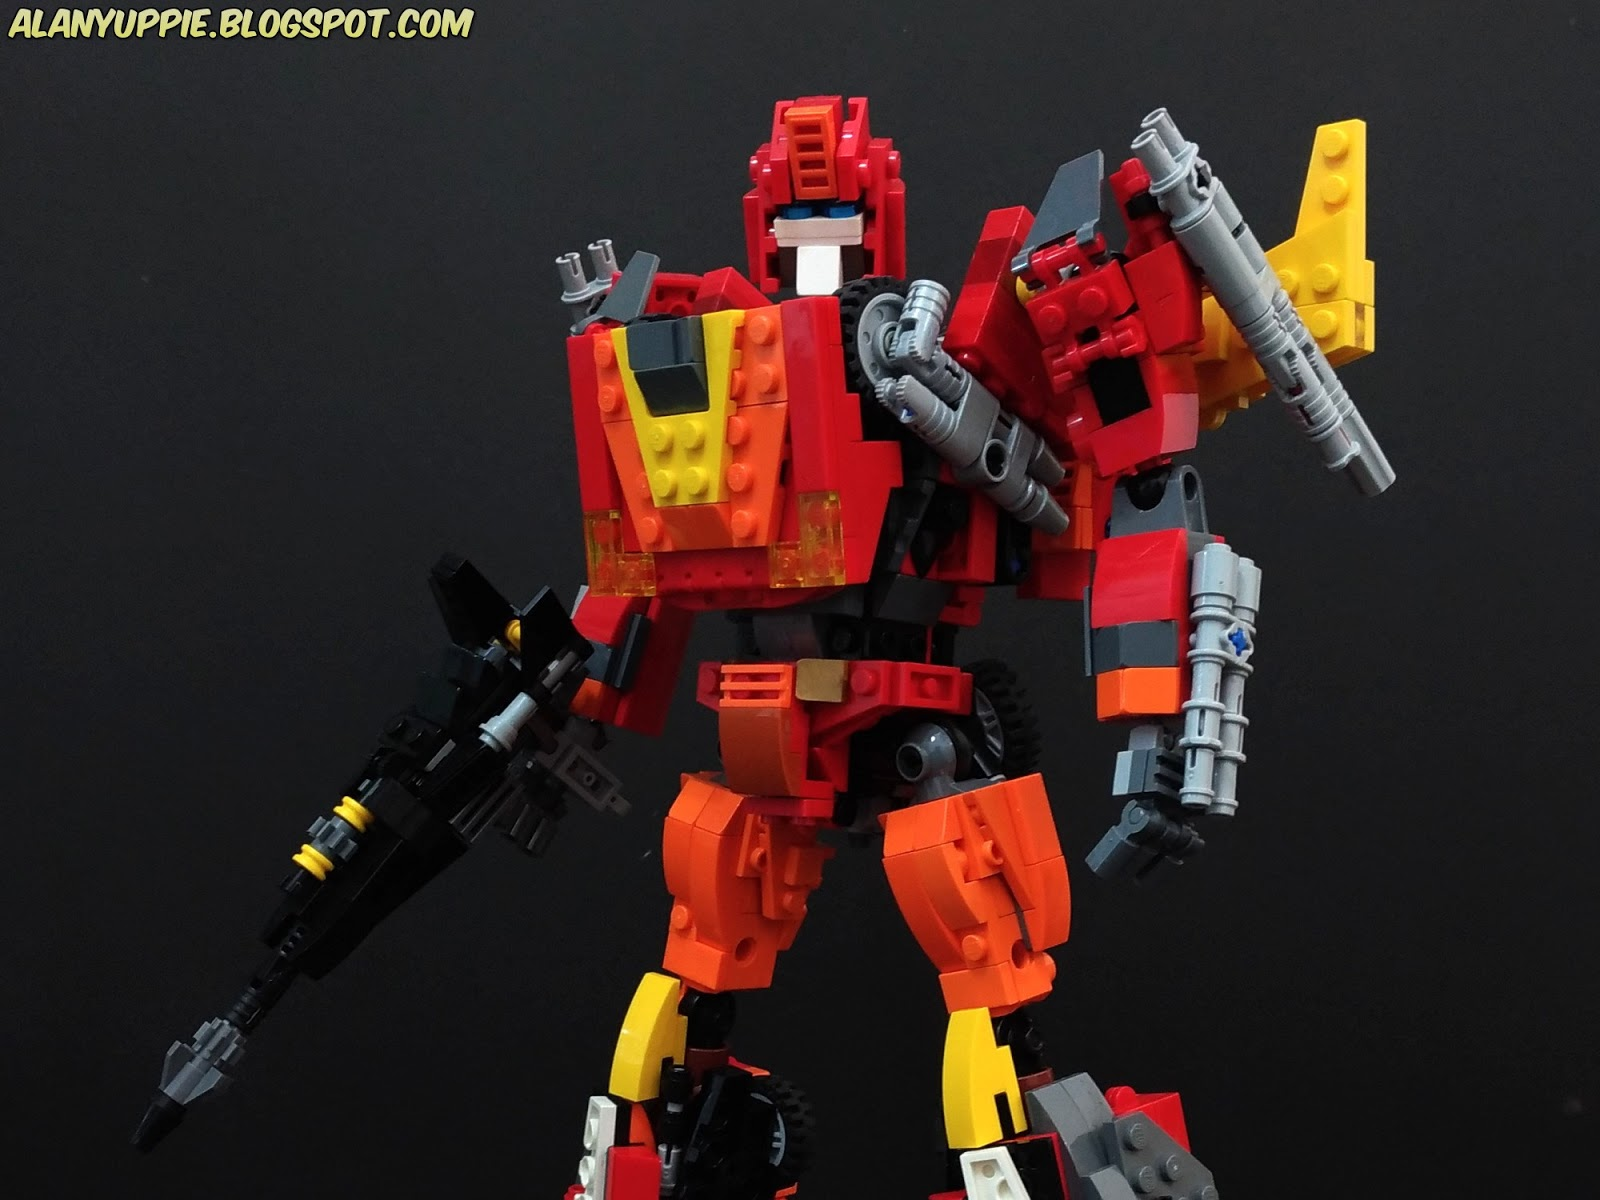 Alanyuppie S Lego Transformers Lego Rodimus Prime Part 3